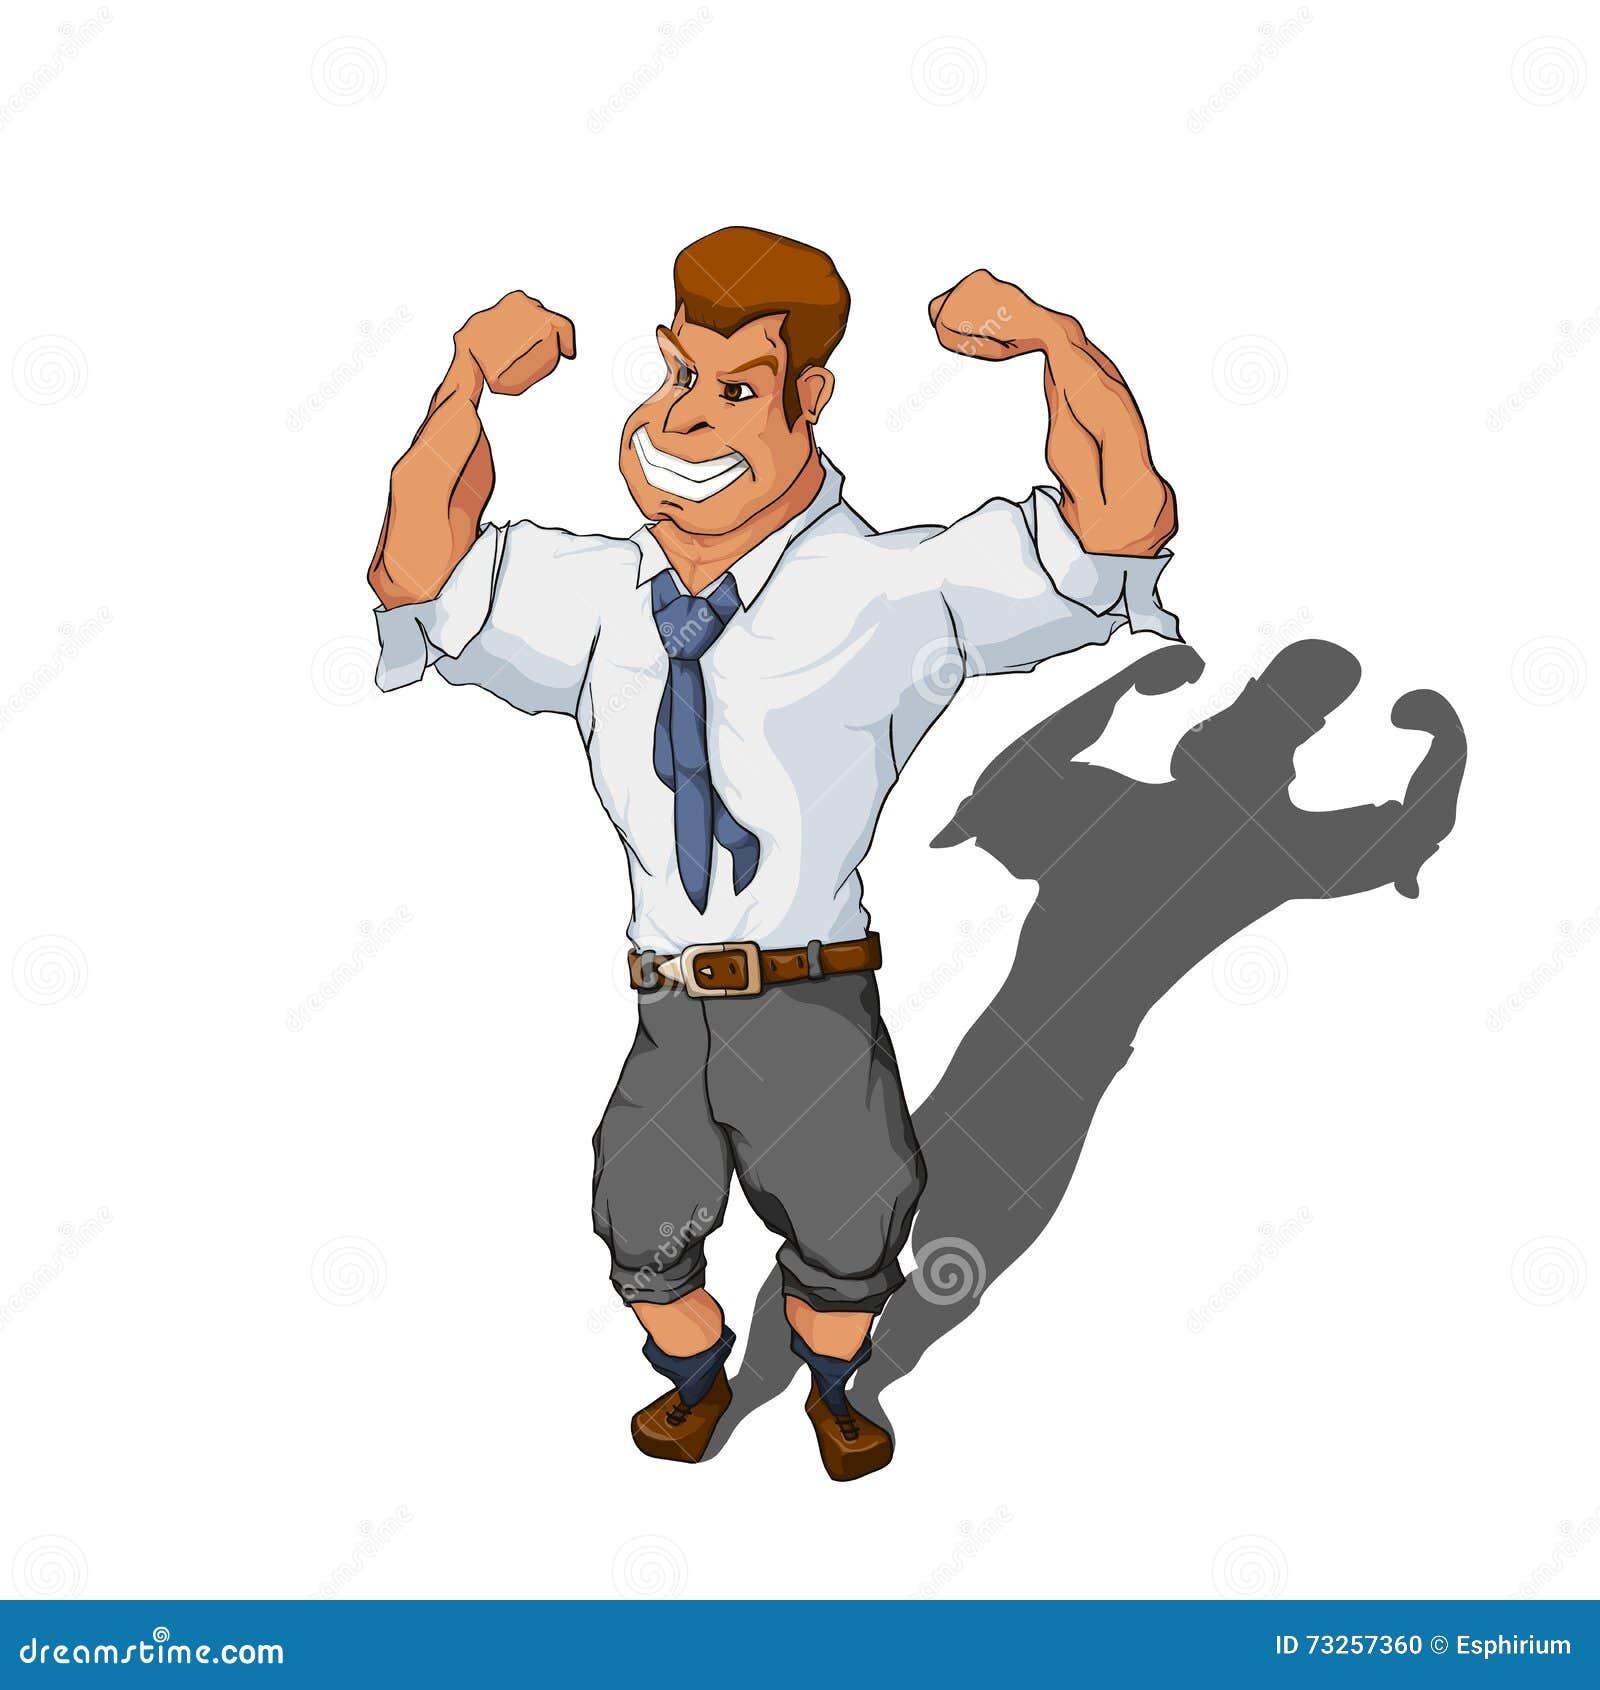 Cartoon Characters In Suits : Cartoon character muscle man adultcartoon